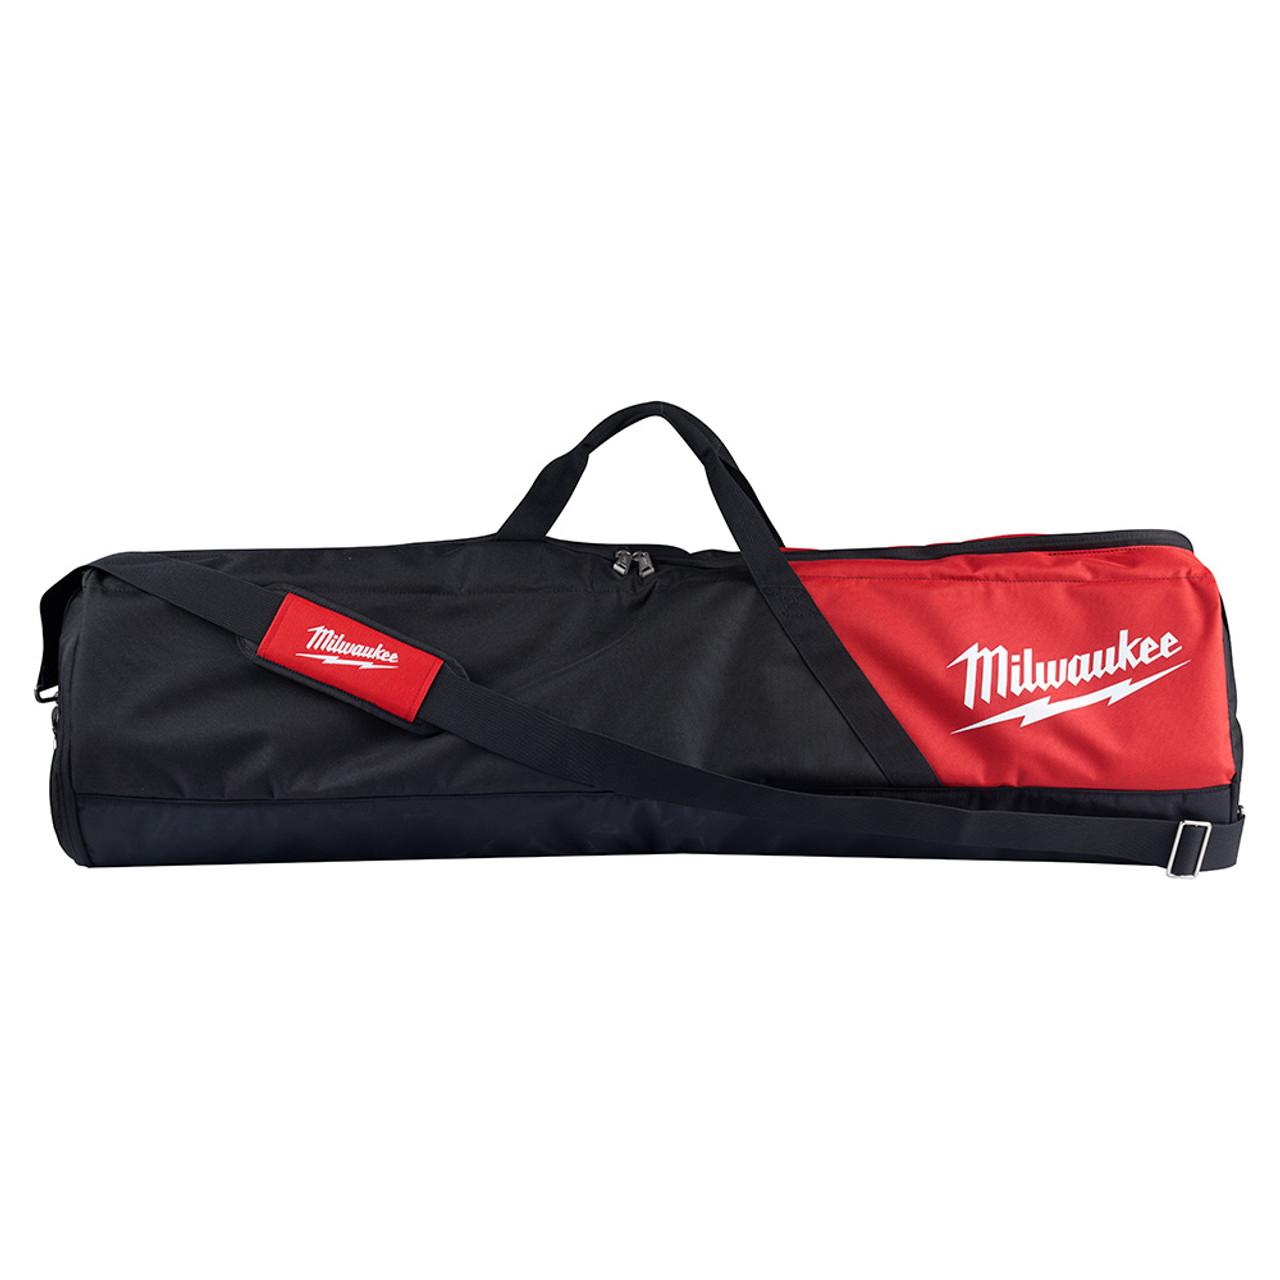 Milwaukee 42-55-2137 M18 ROCKET Tower Light Carry Bag